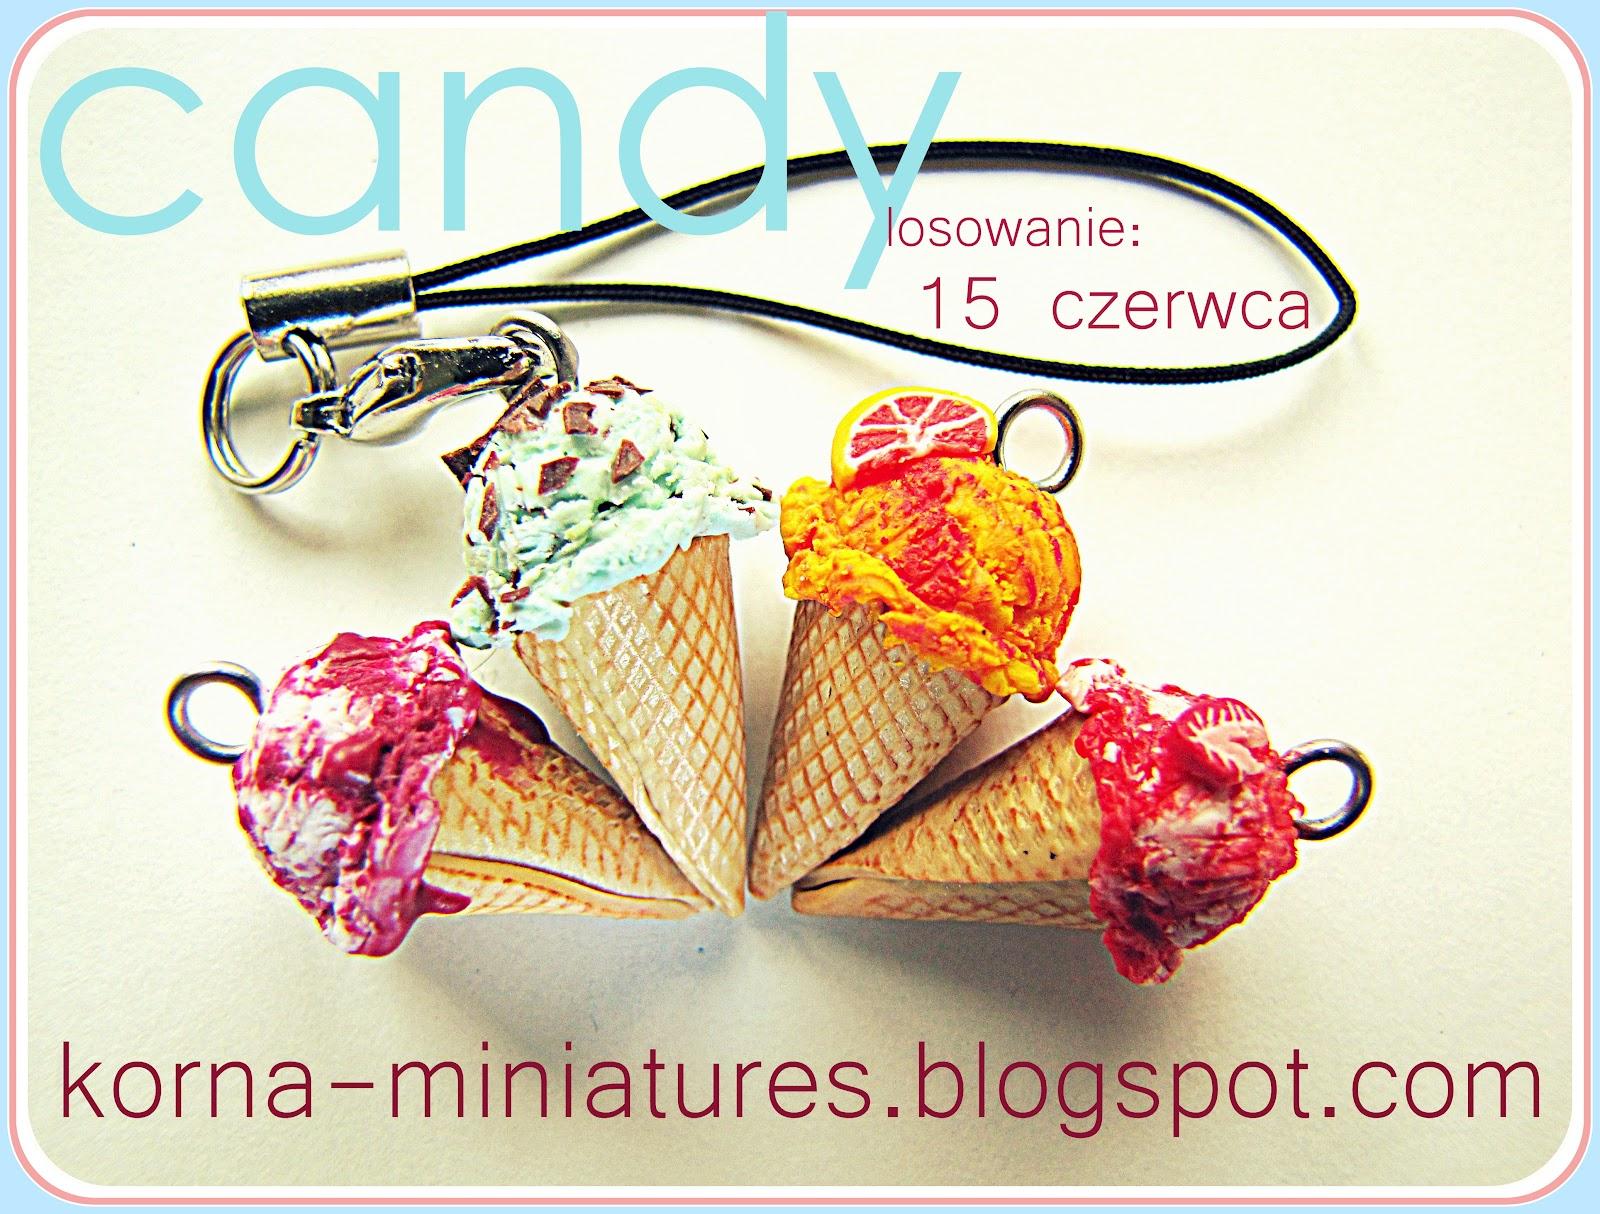 Candy u Korny